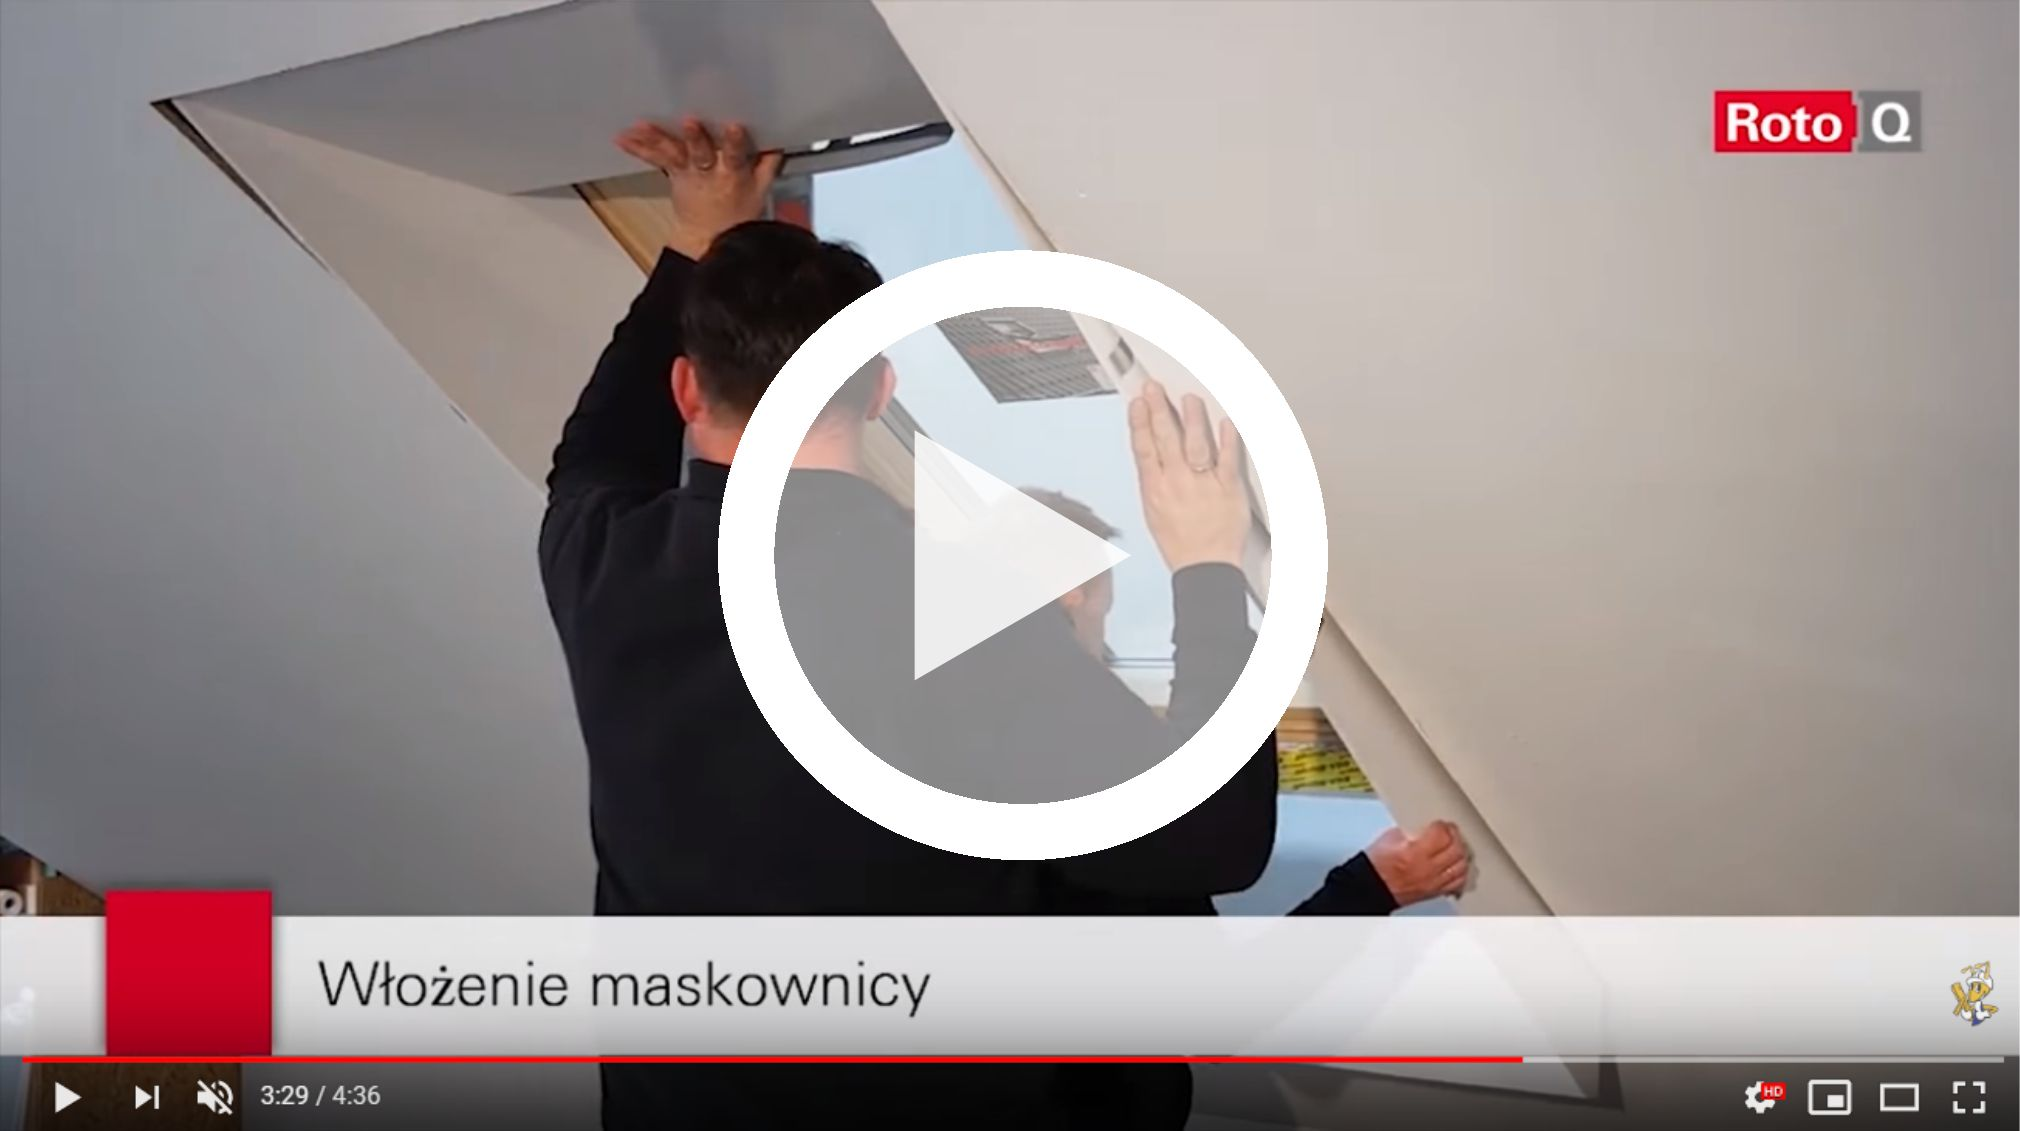 montaz-maskownicy-okna-rotoq